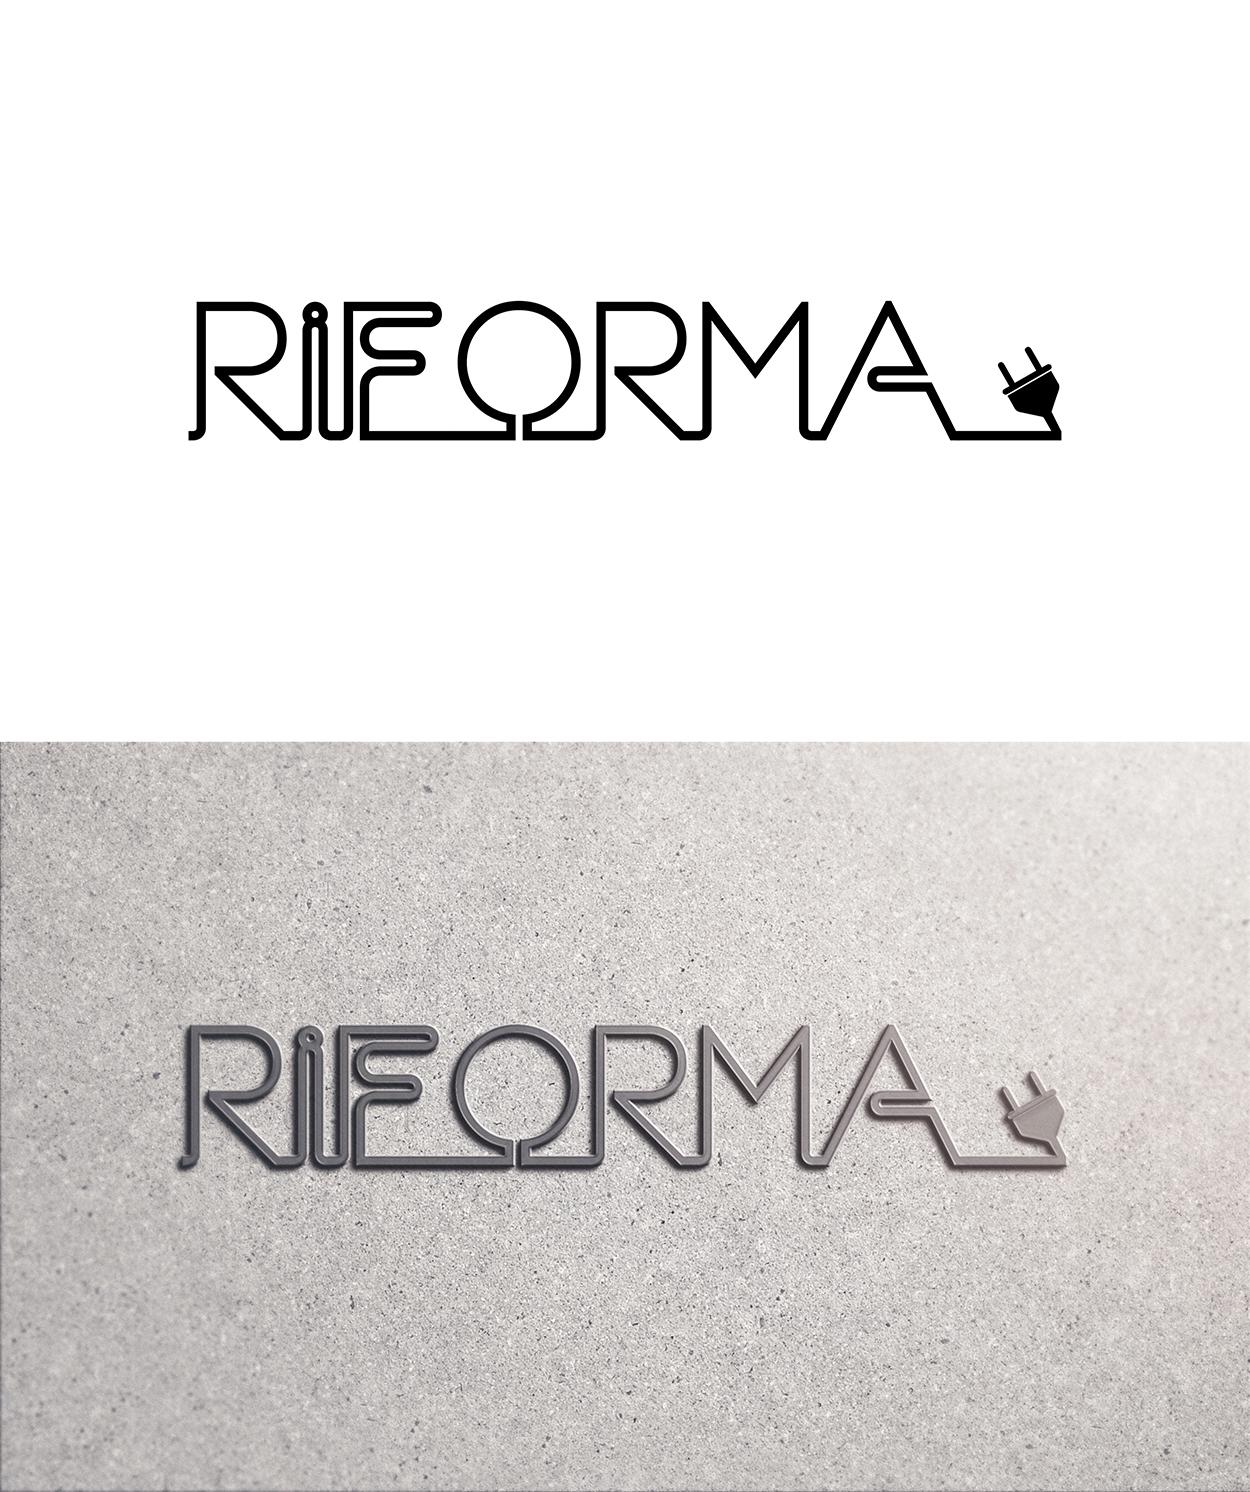 Разработка логотипа и элементов фирменного стиля фото f_526579384985ca6d.jpg